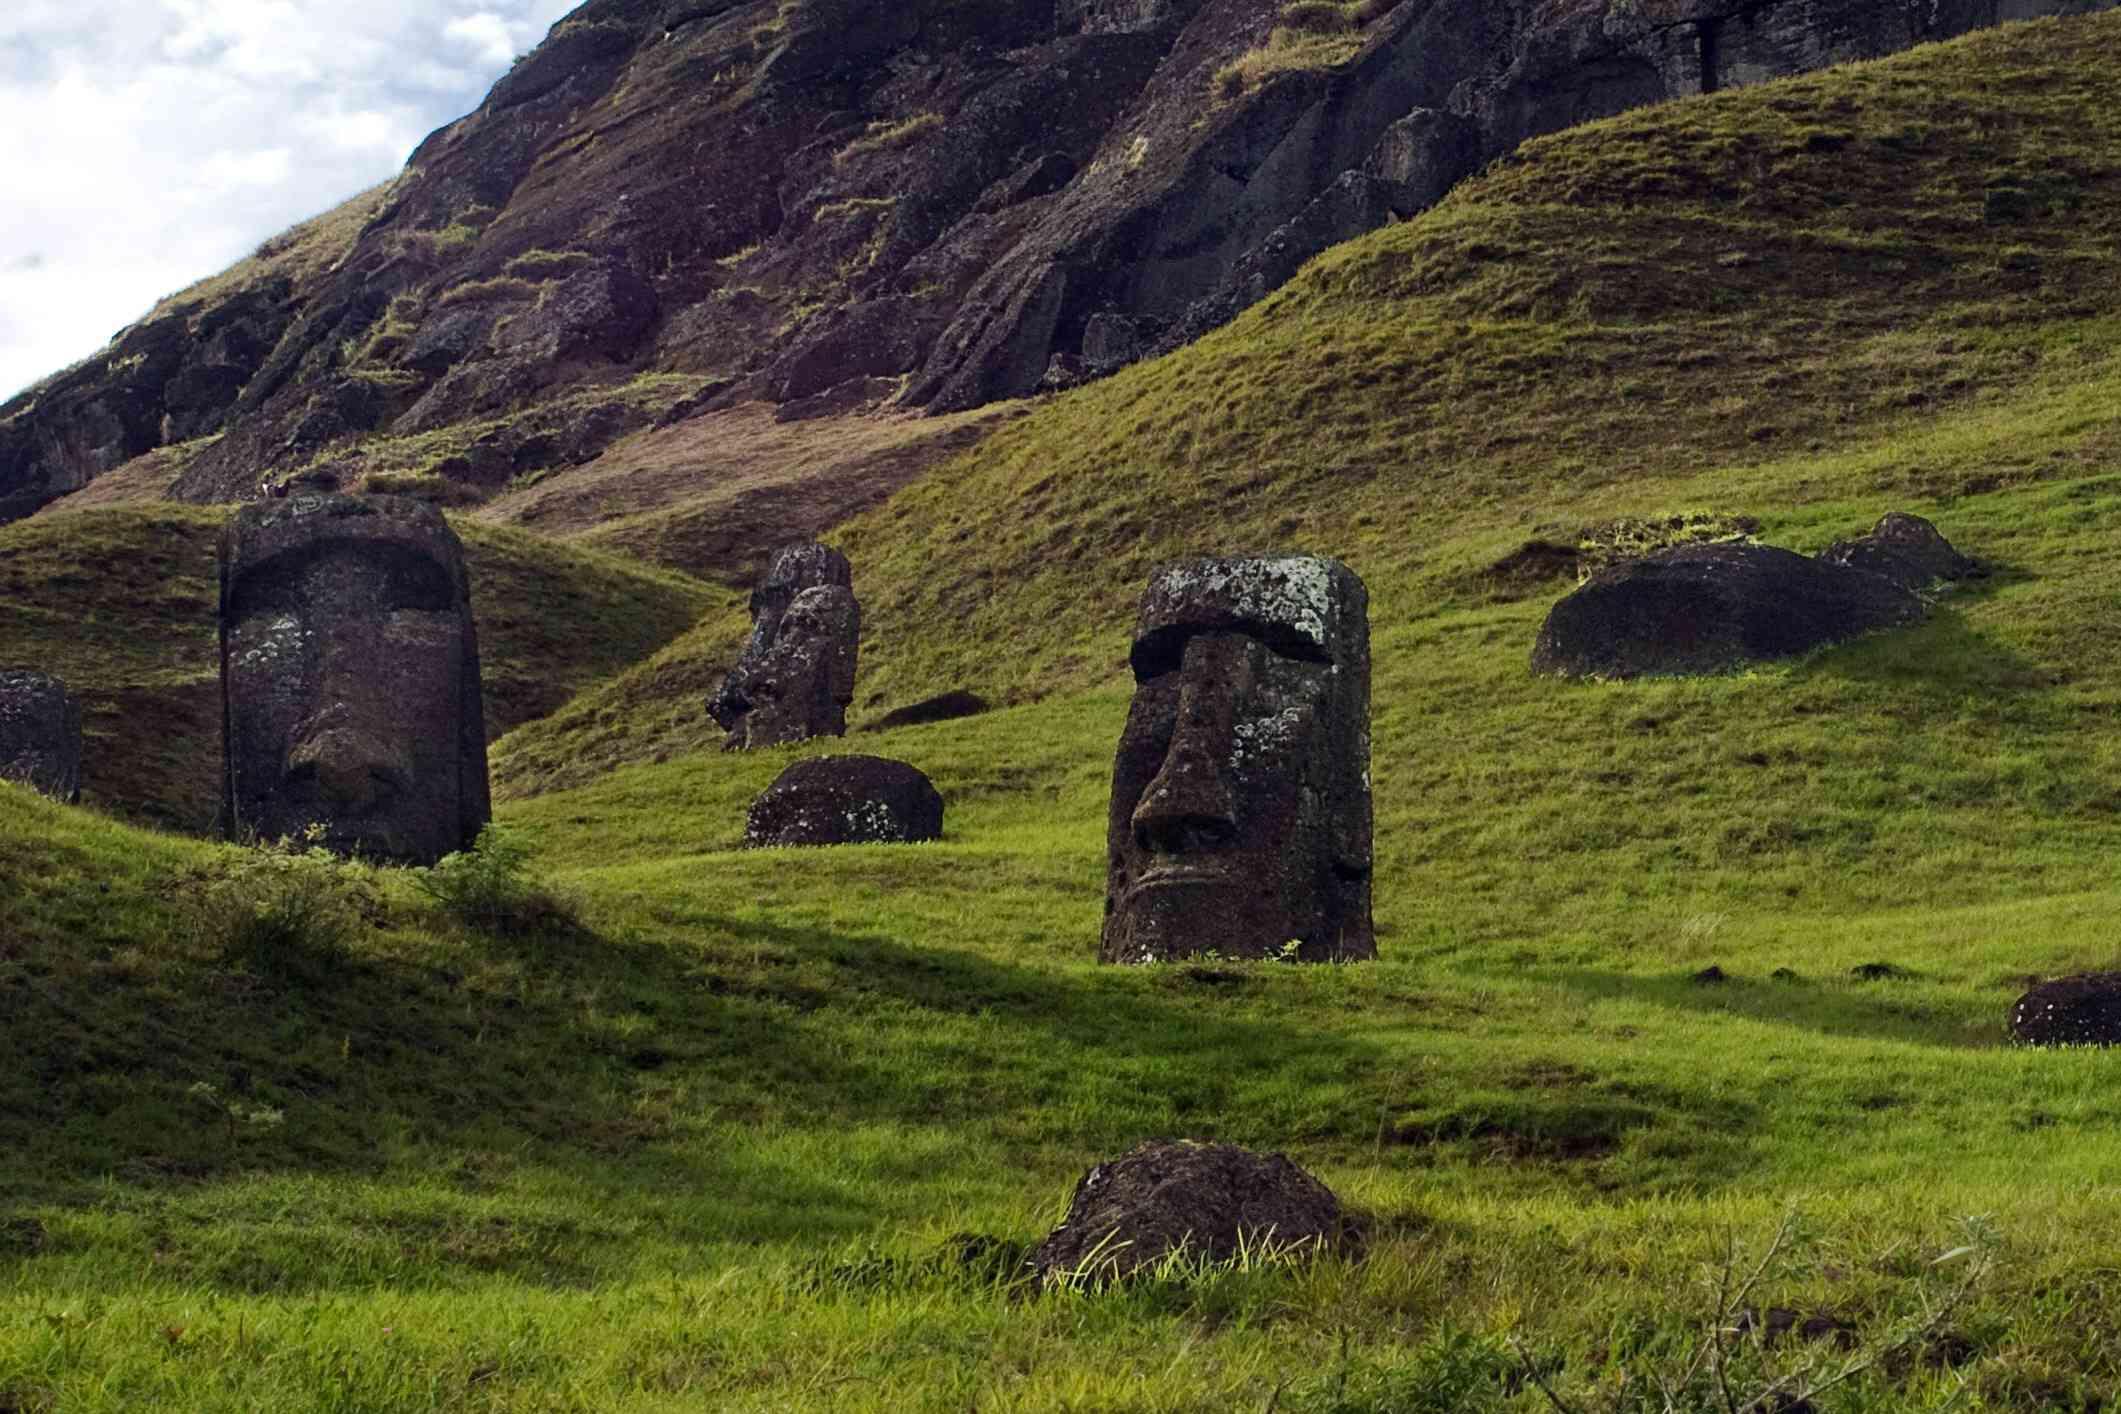 The overgrown quarry at Raro Rakaru, Easter Island, features many submerged moai